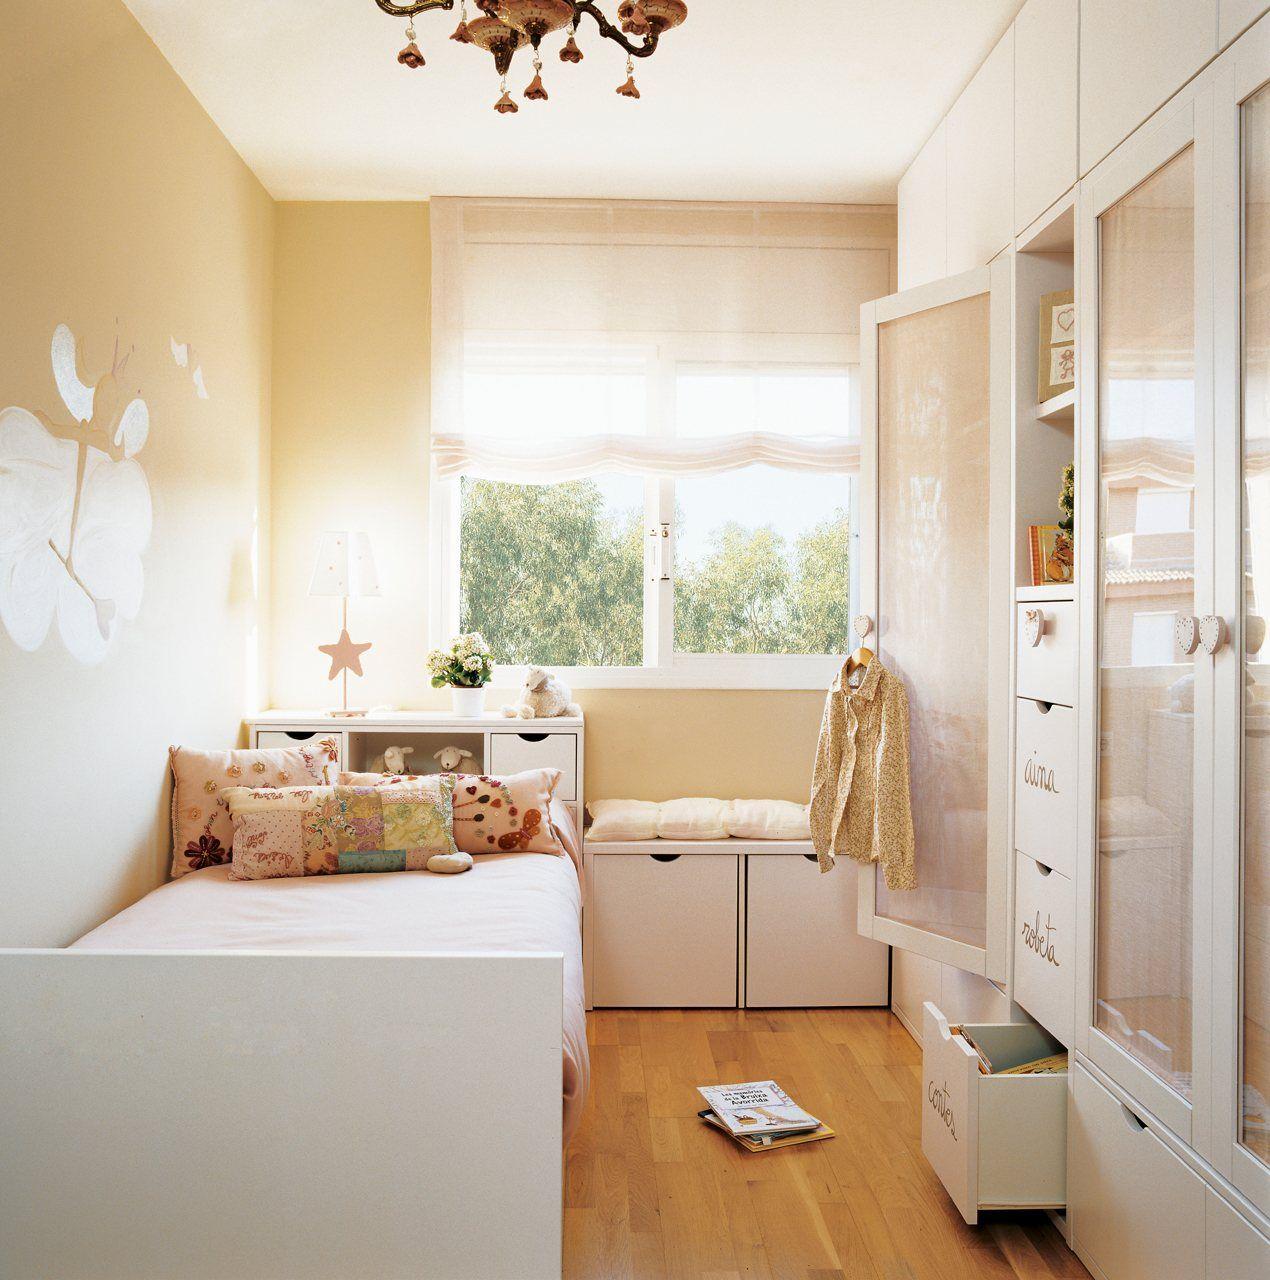 Dormitorios infantiles peque os s cales partido for Dormitorio ninos diseno